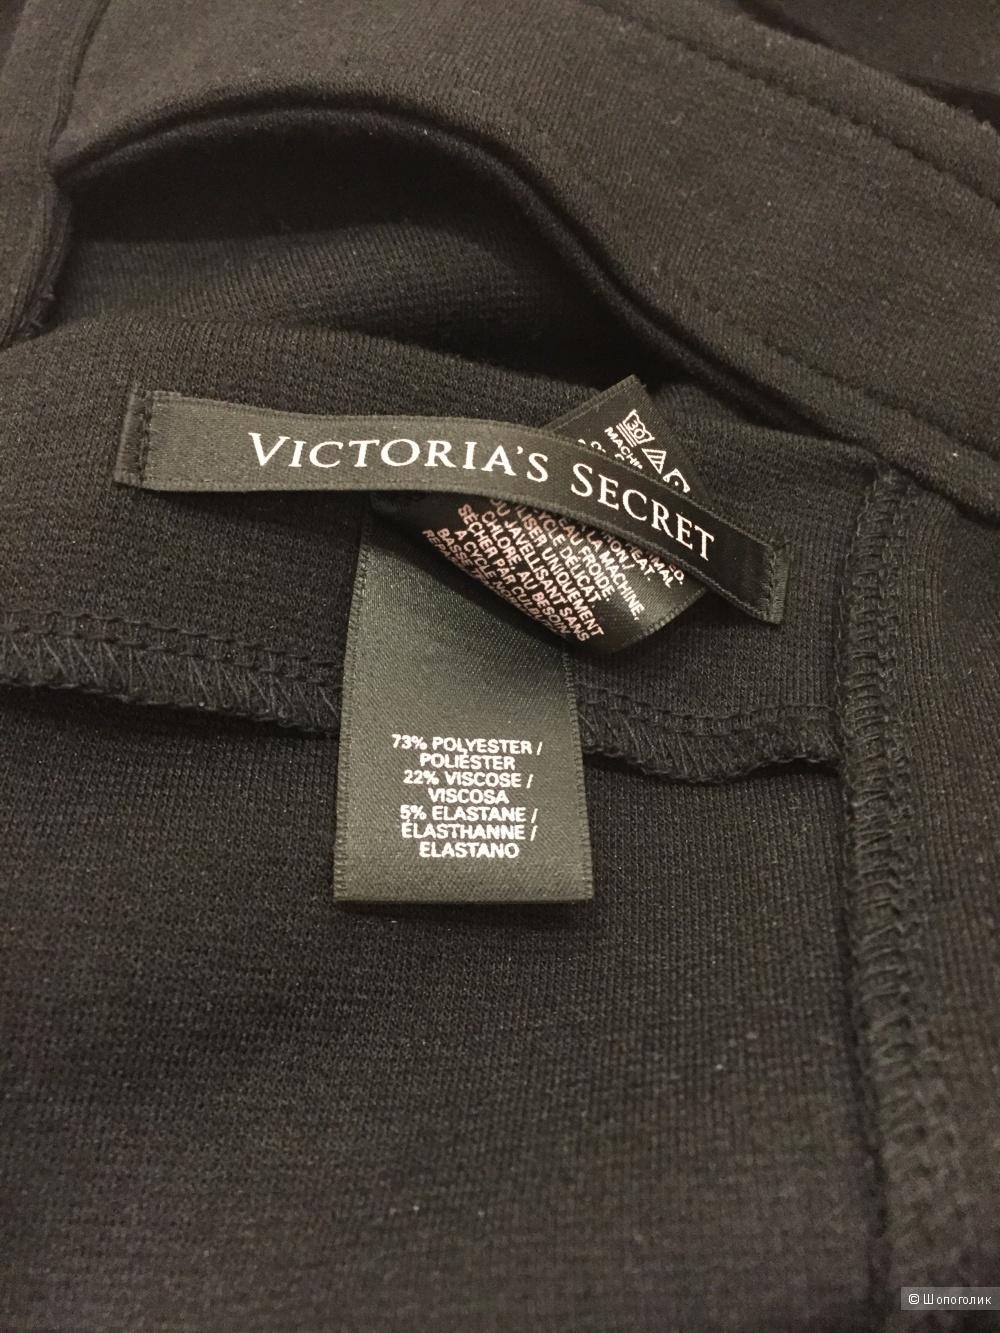 Топ victoria's secret новый S